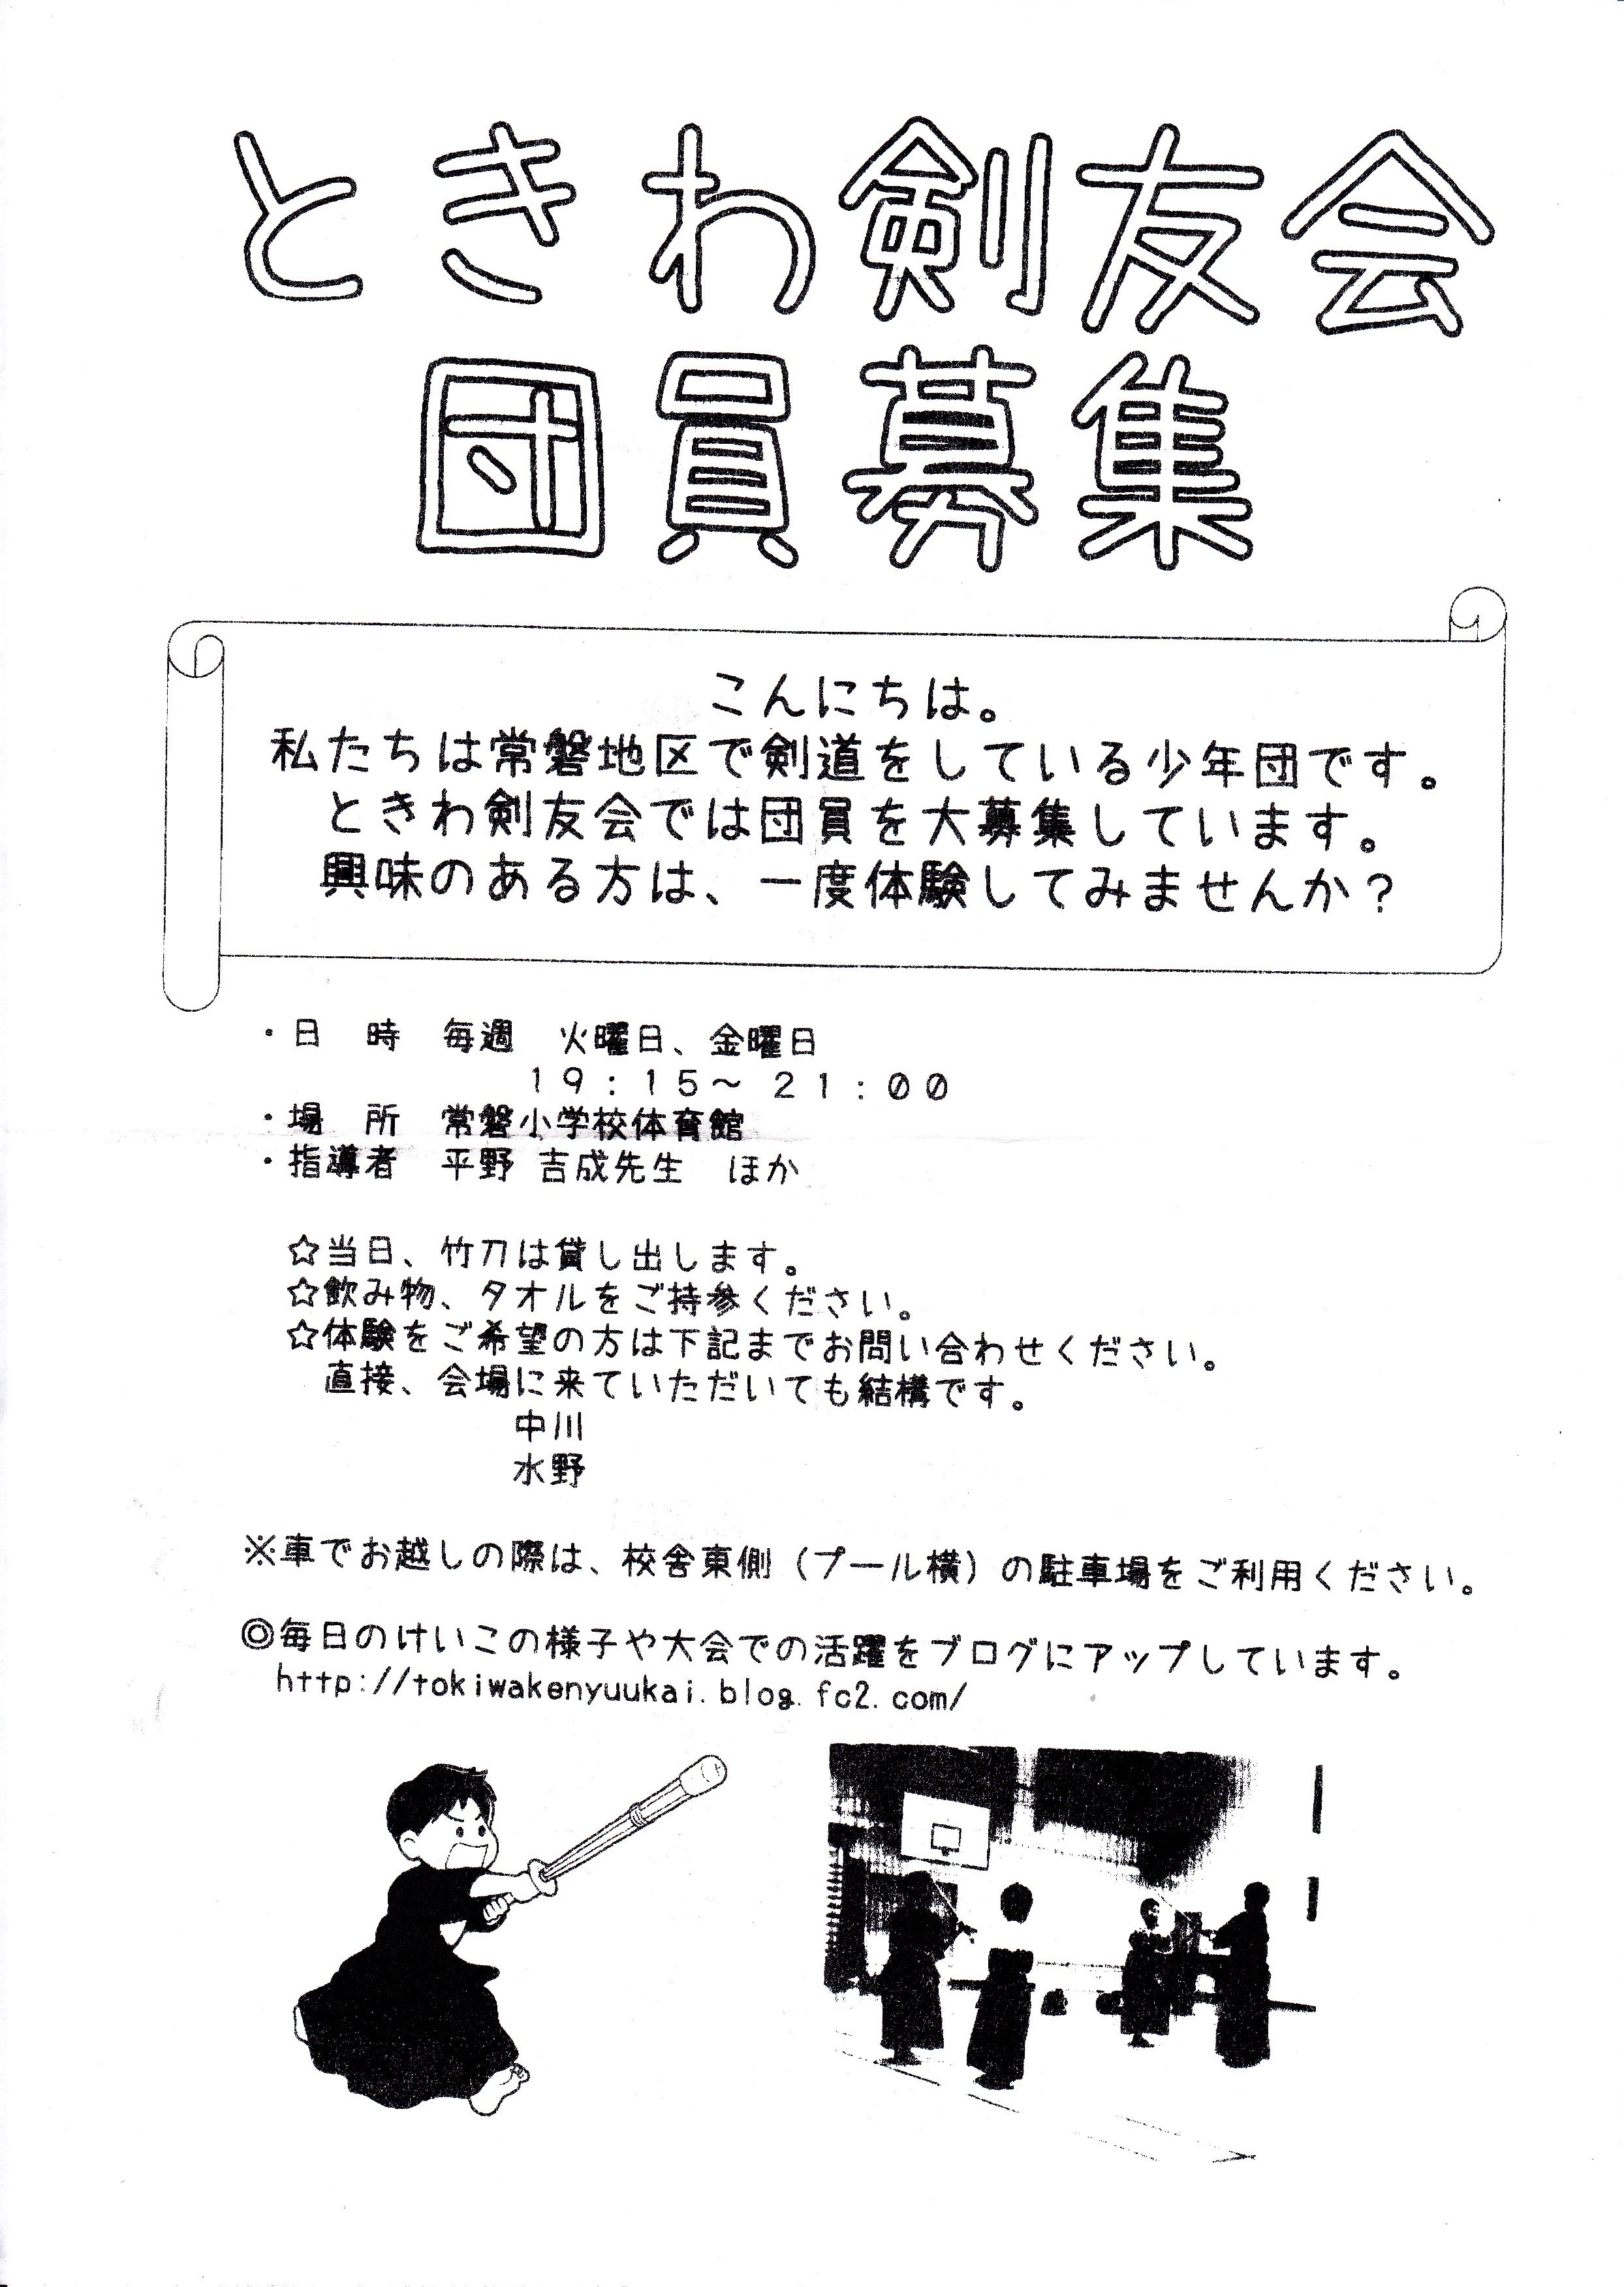 常磐剣友会団員募集チラシ